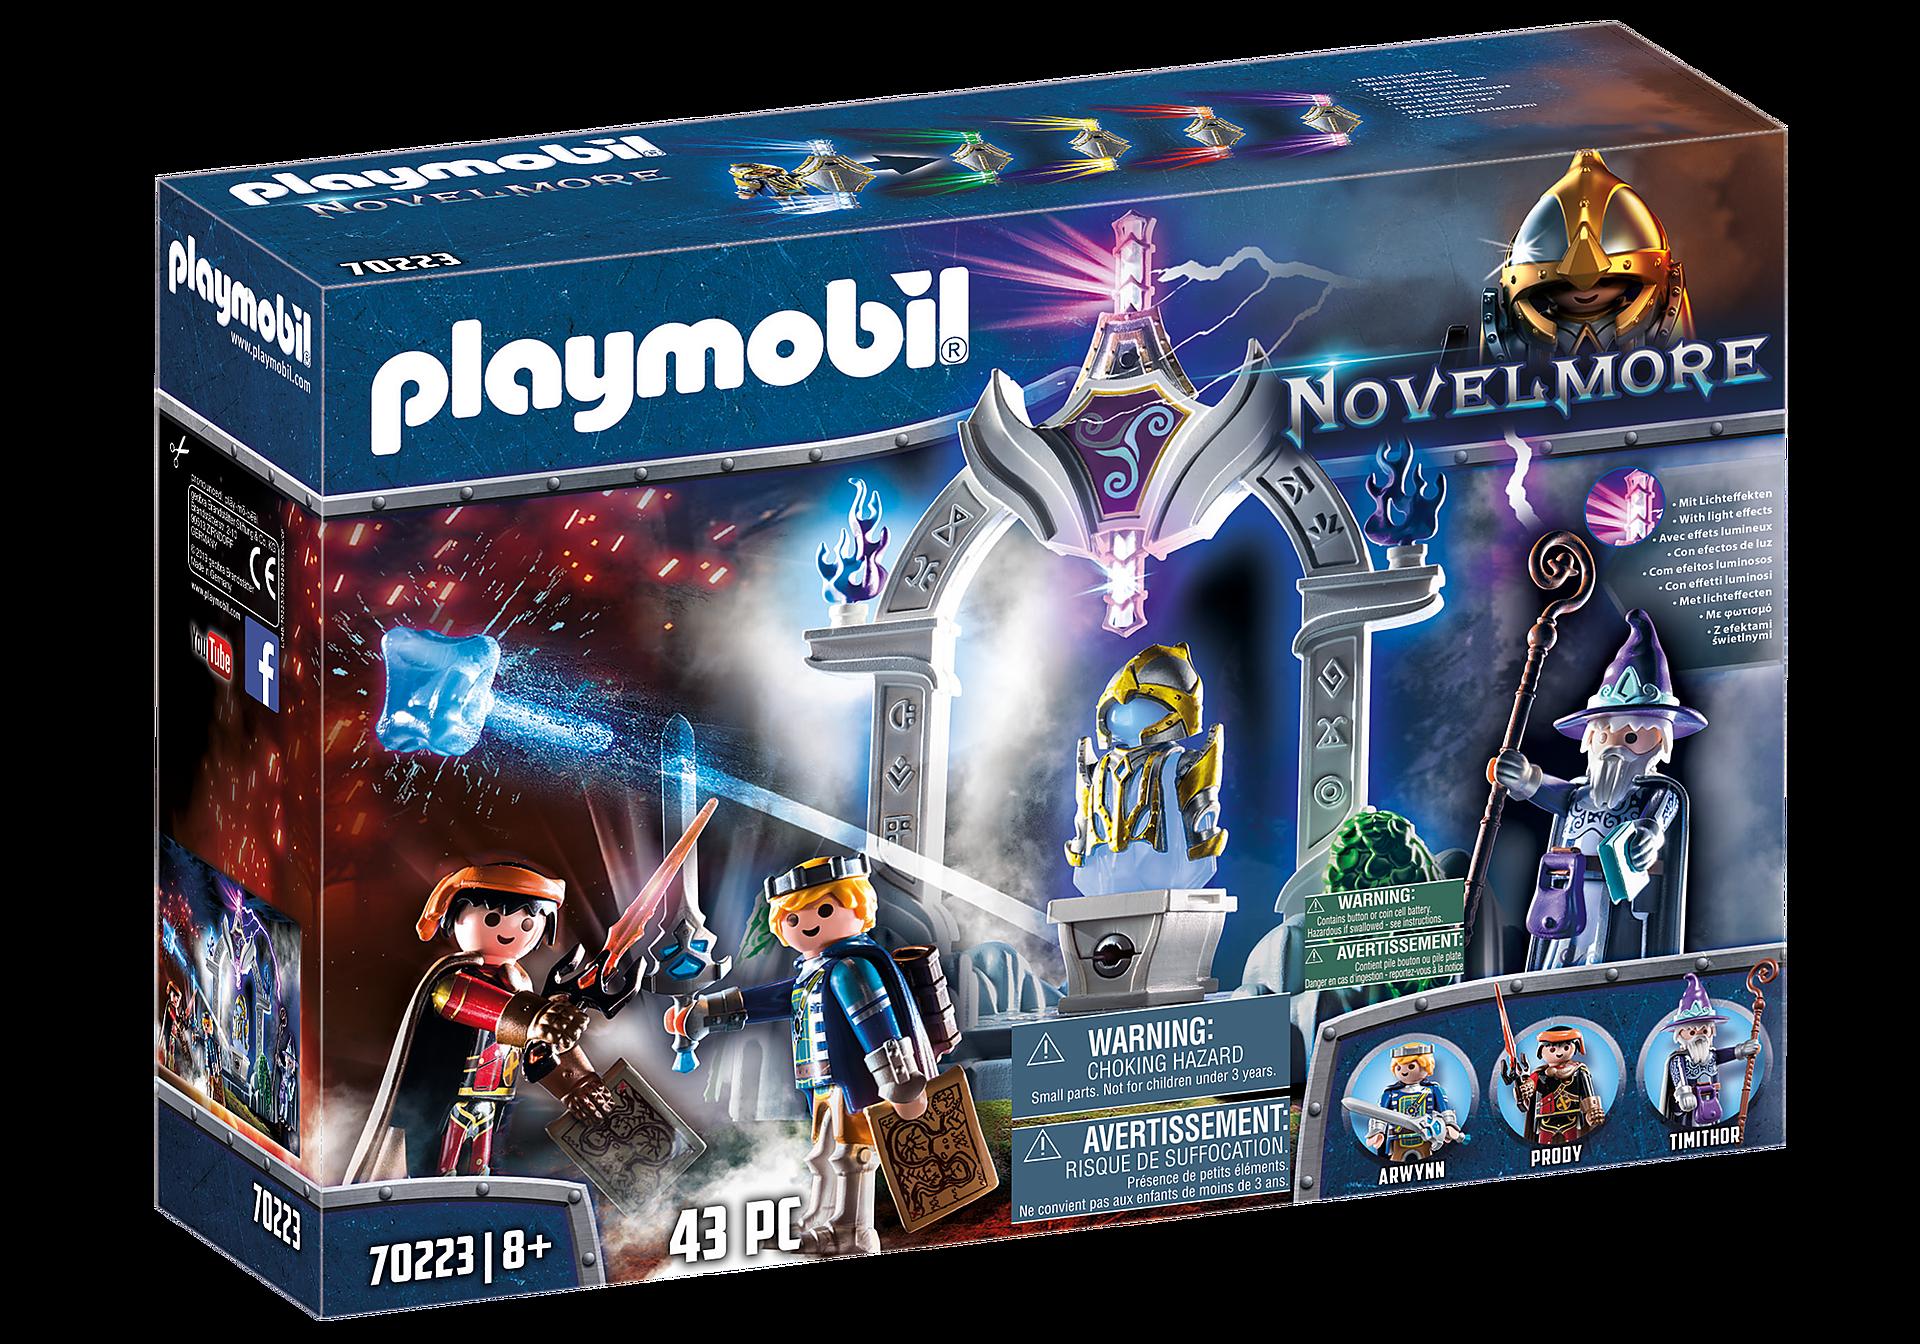 Playmobil - Magical Shrine (70223)